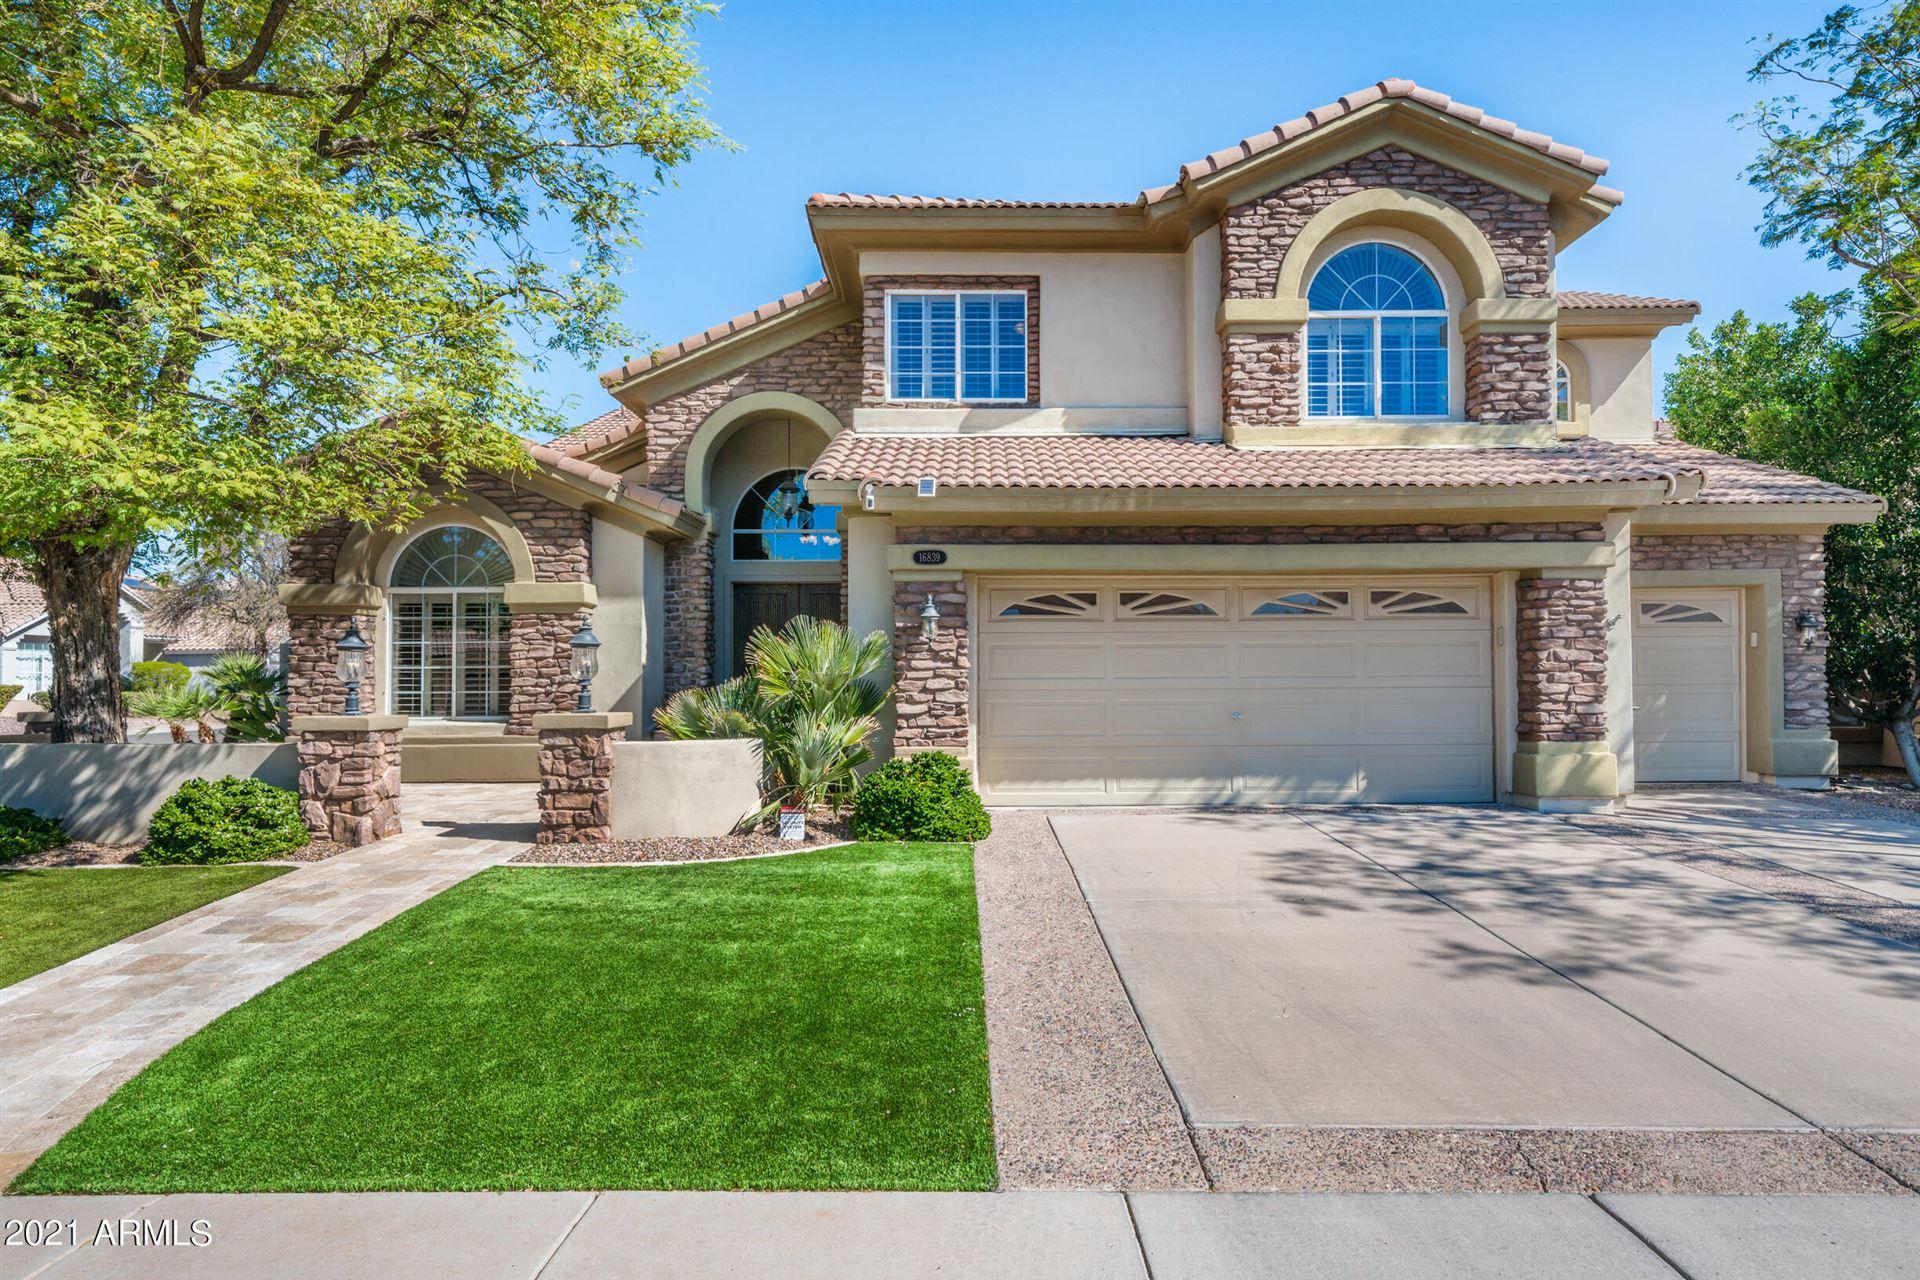 Photo of 16839 N 60TH Place, Scottsdale, AZ 85254 (MLS # 6201176)